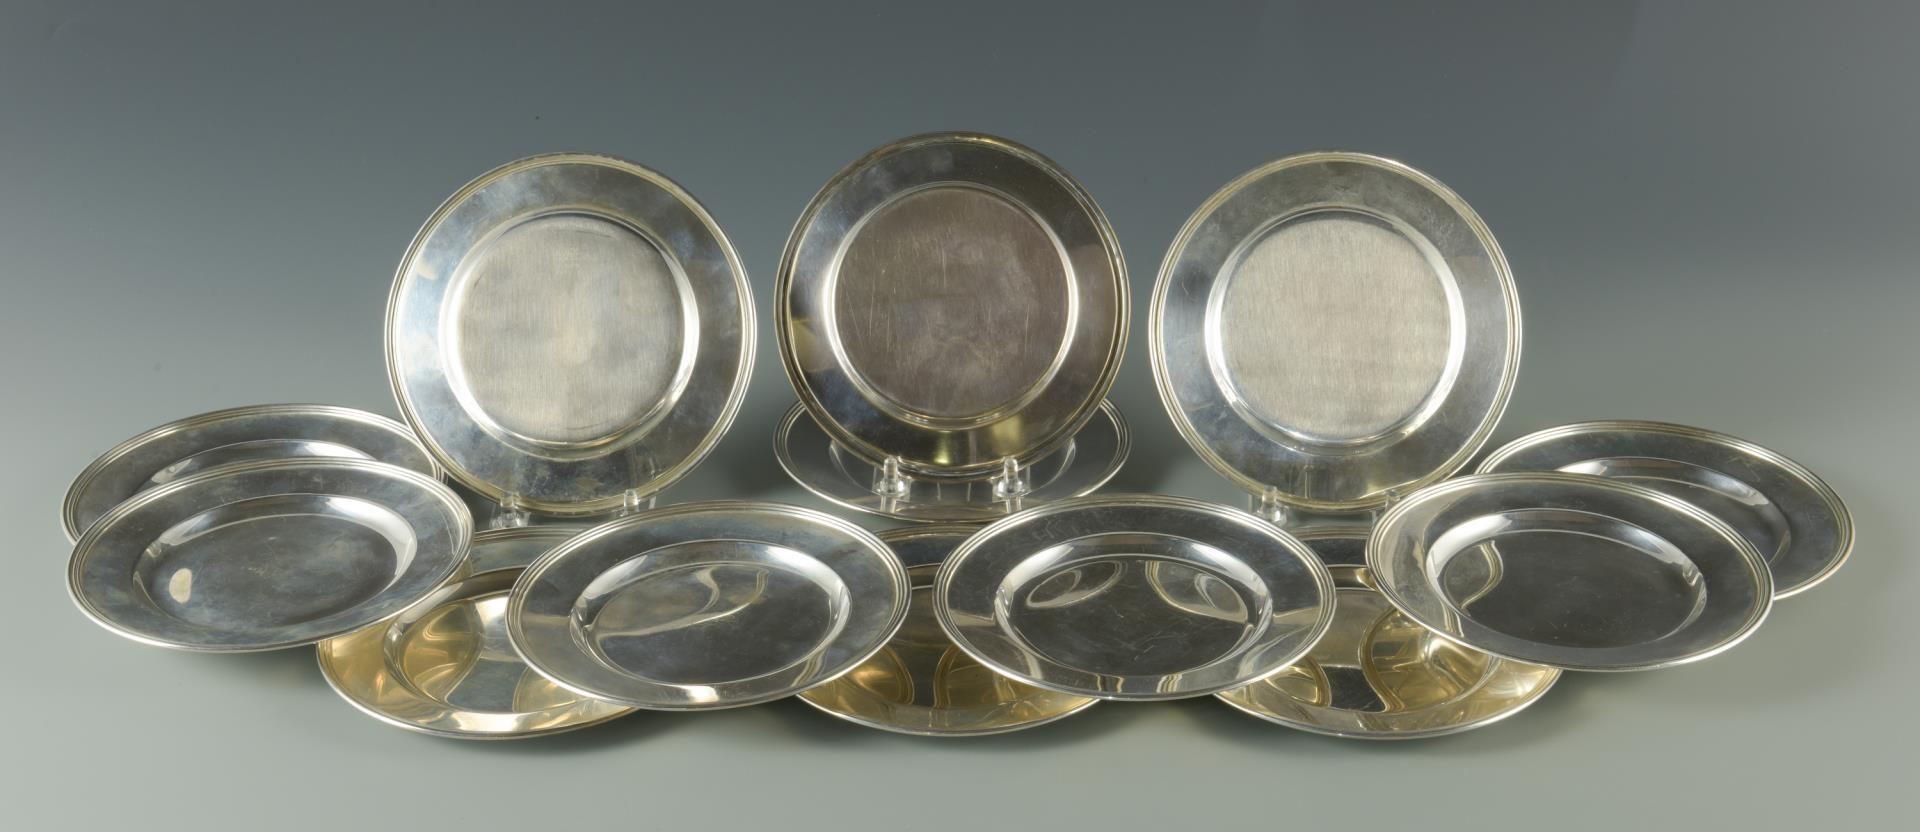 Lot 2: 12 Sterling Bread Plates plus 1 trophy plate